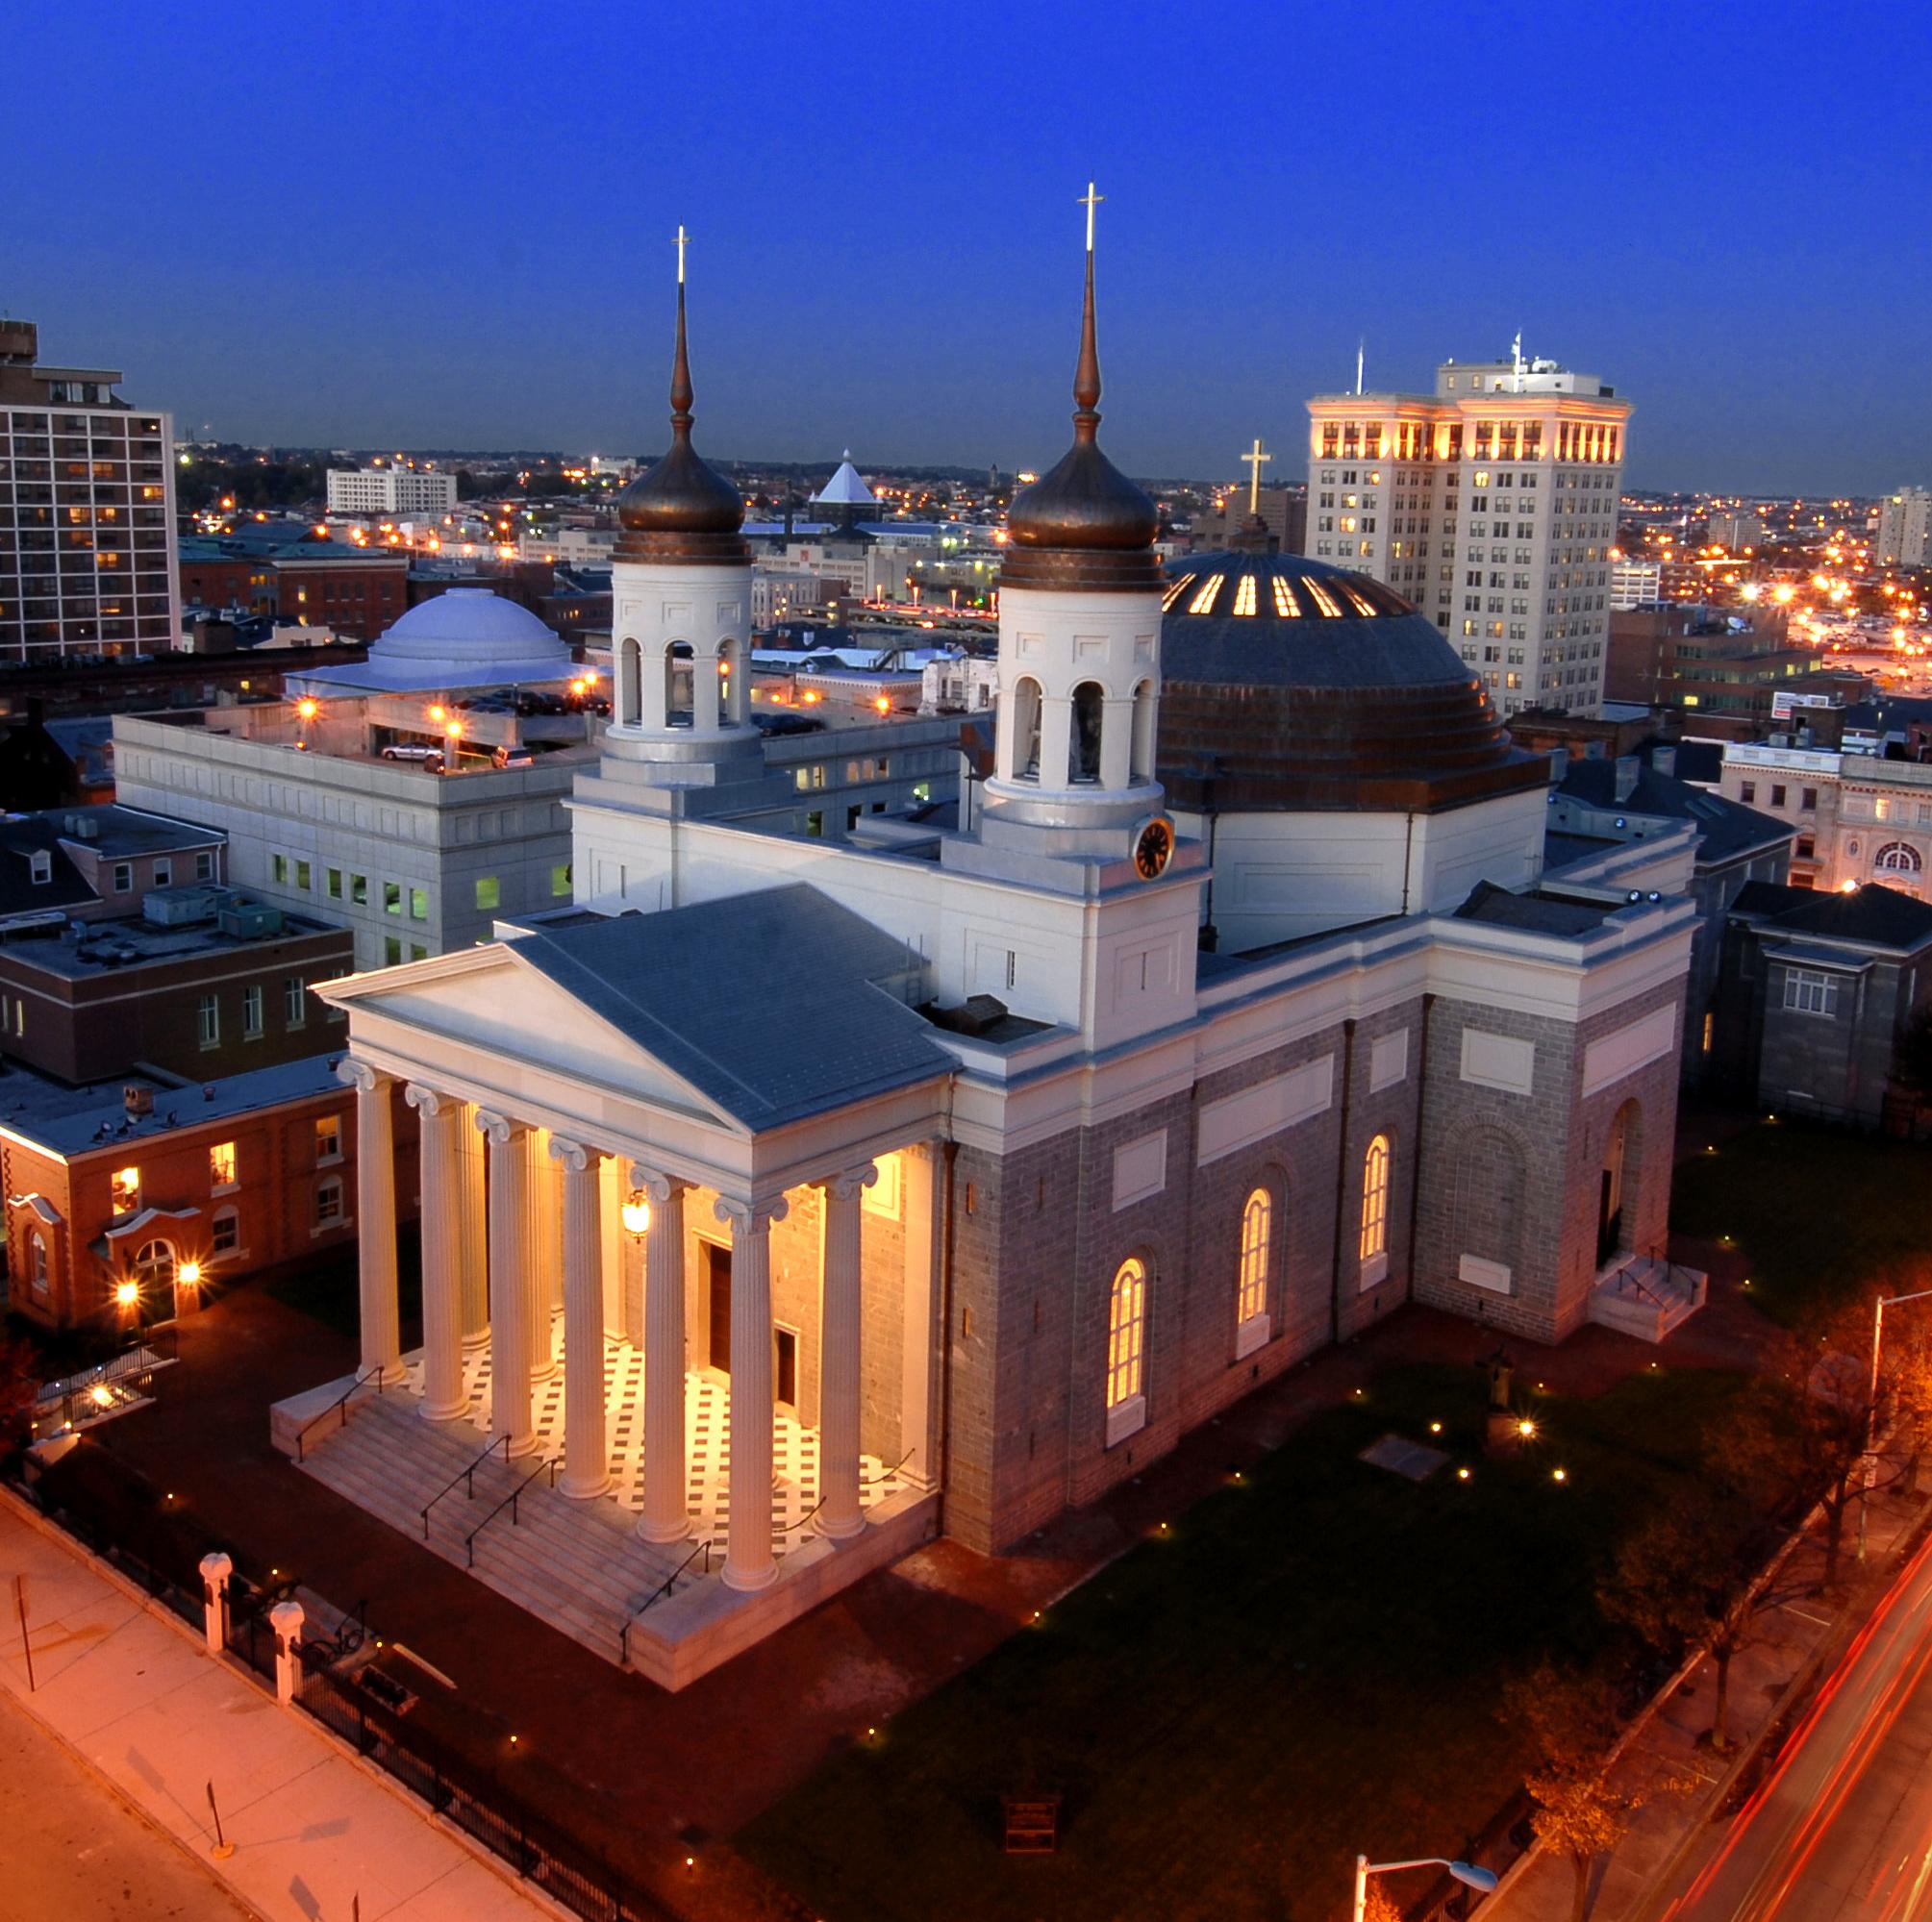 Restoring the Light in Baltimore's Basilica